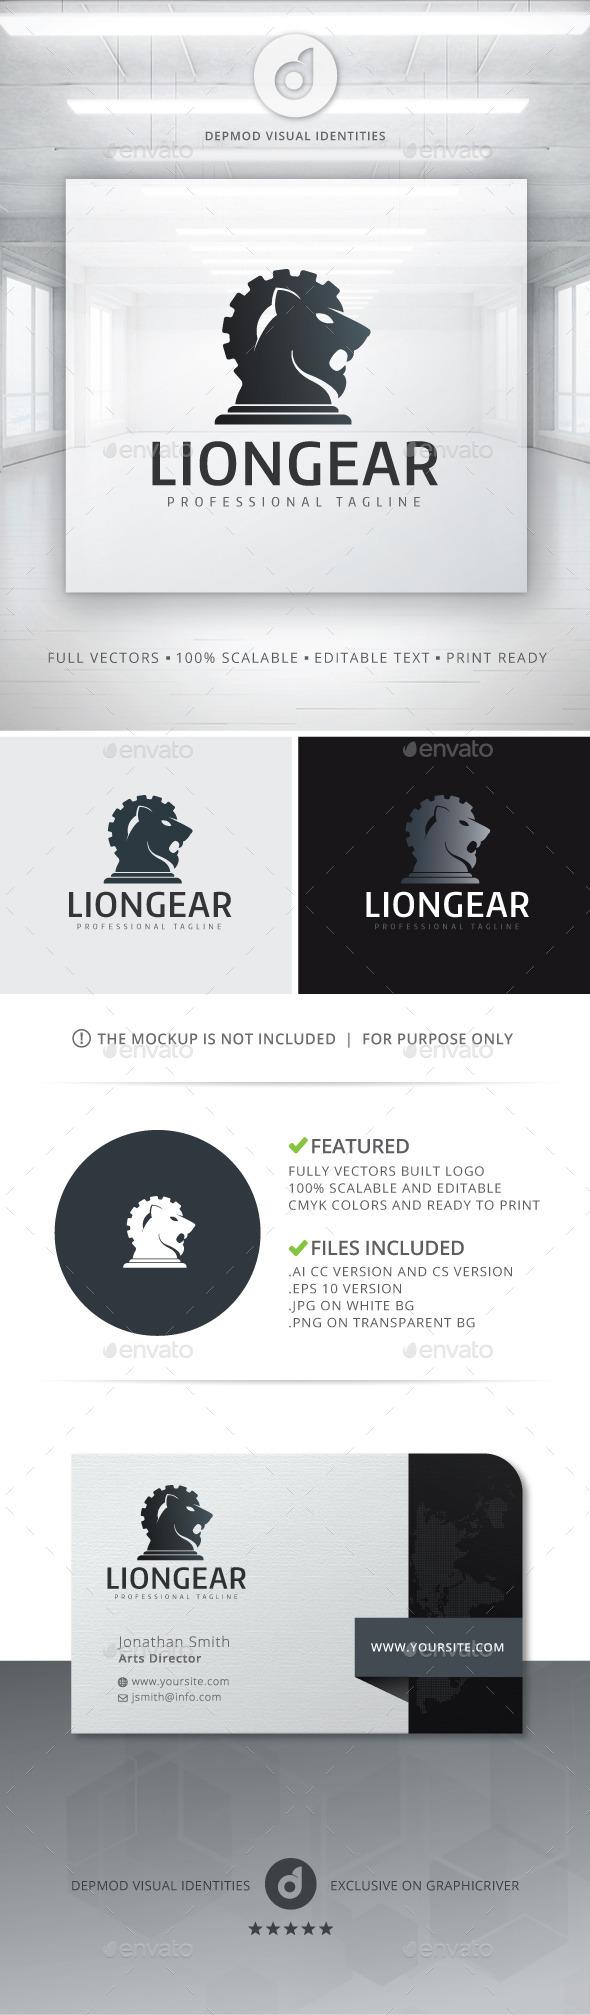 Lion Gear Logo